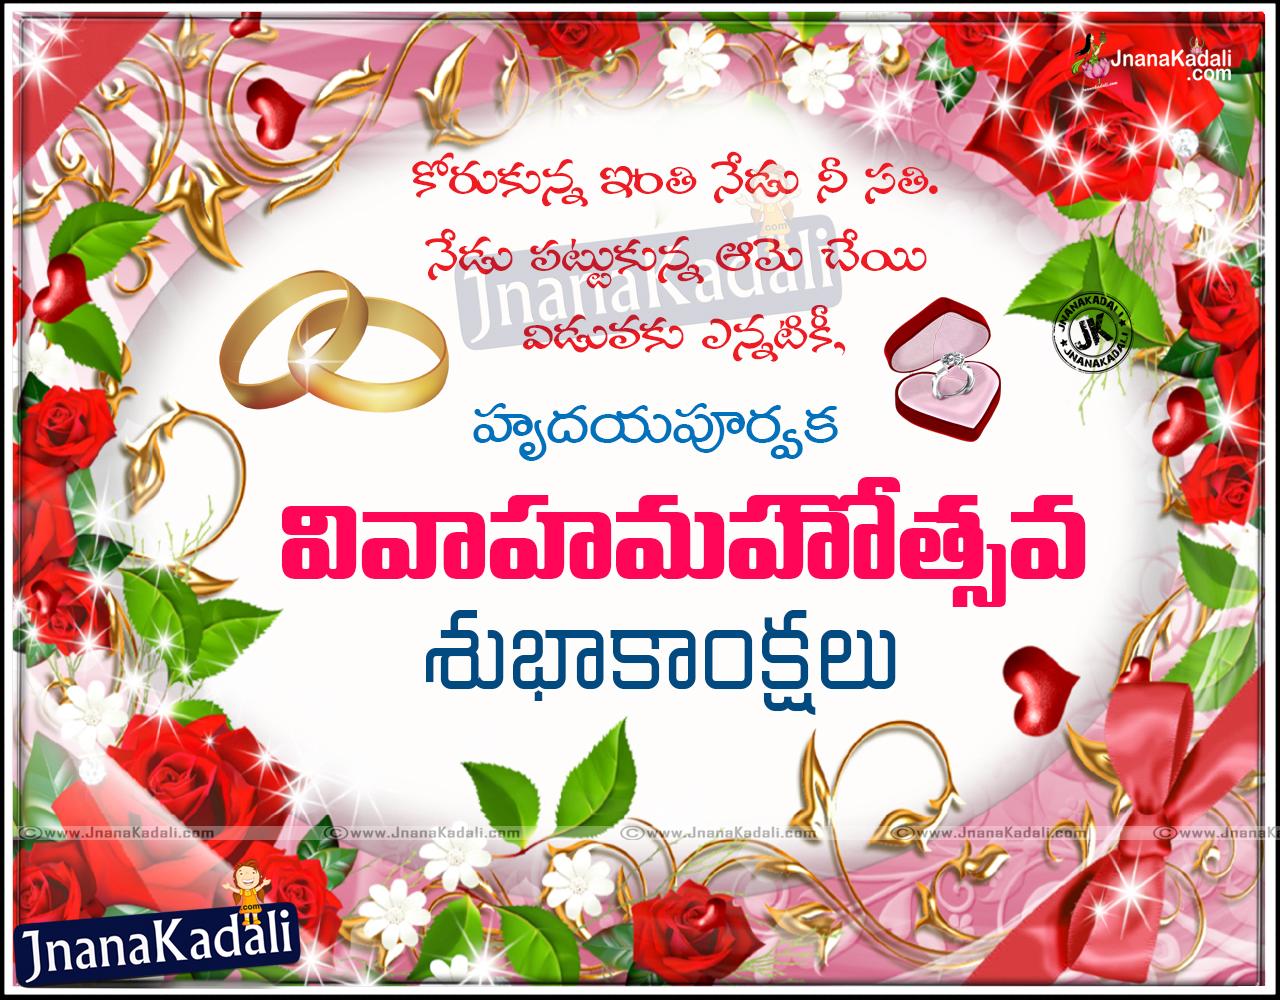 Best Telugu Marriage Anniversary Greetings Wedding Kavithalu Jnana Kadali Com Telugu Quotes English Quotes Hindi Quotes Tamil Quotes Dharmasandehalu